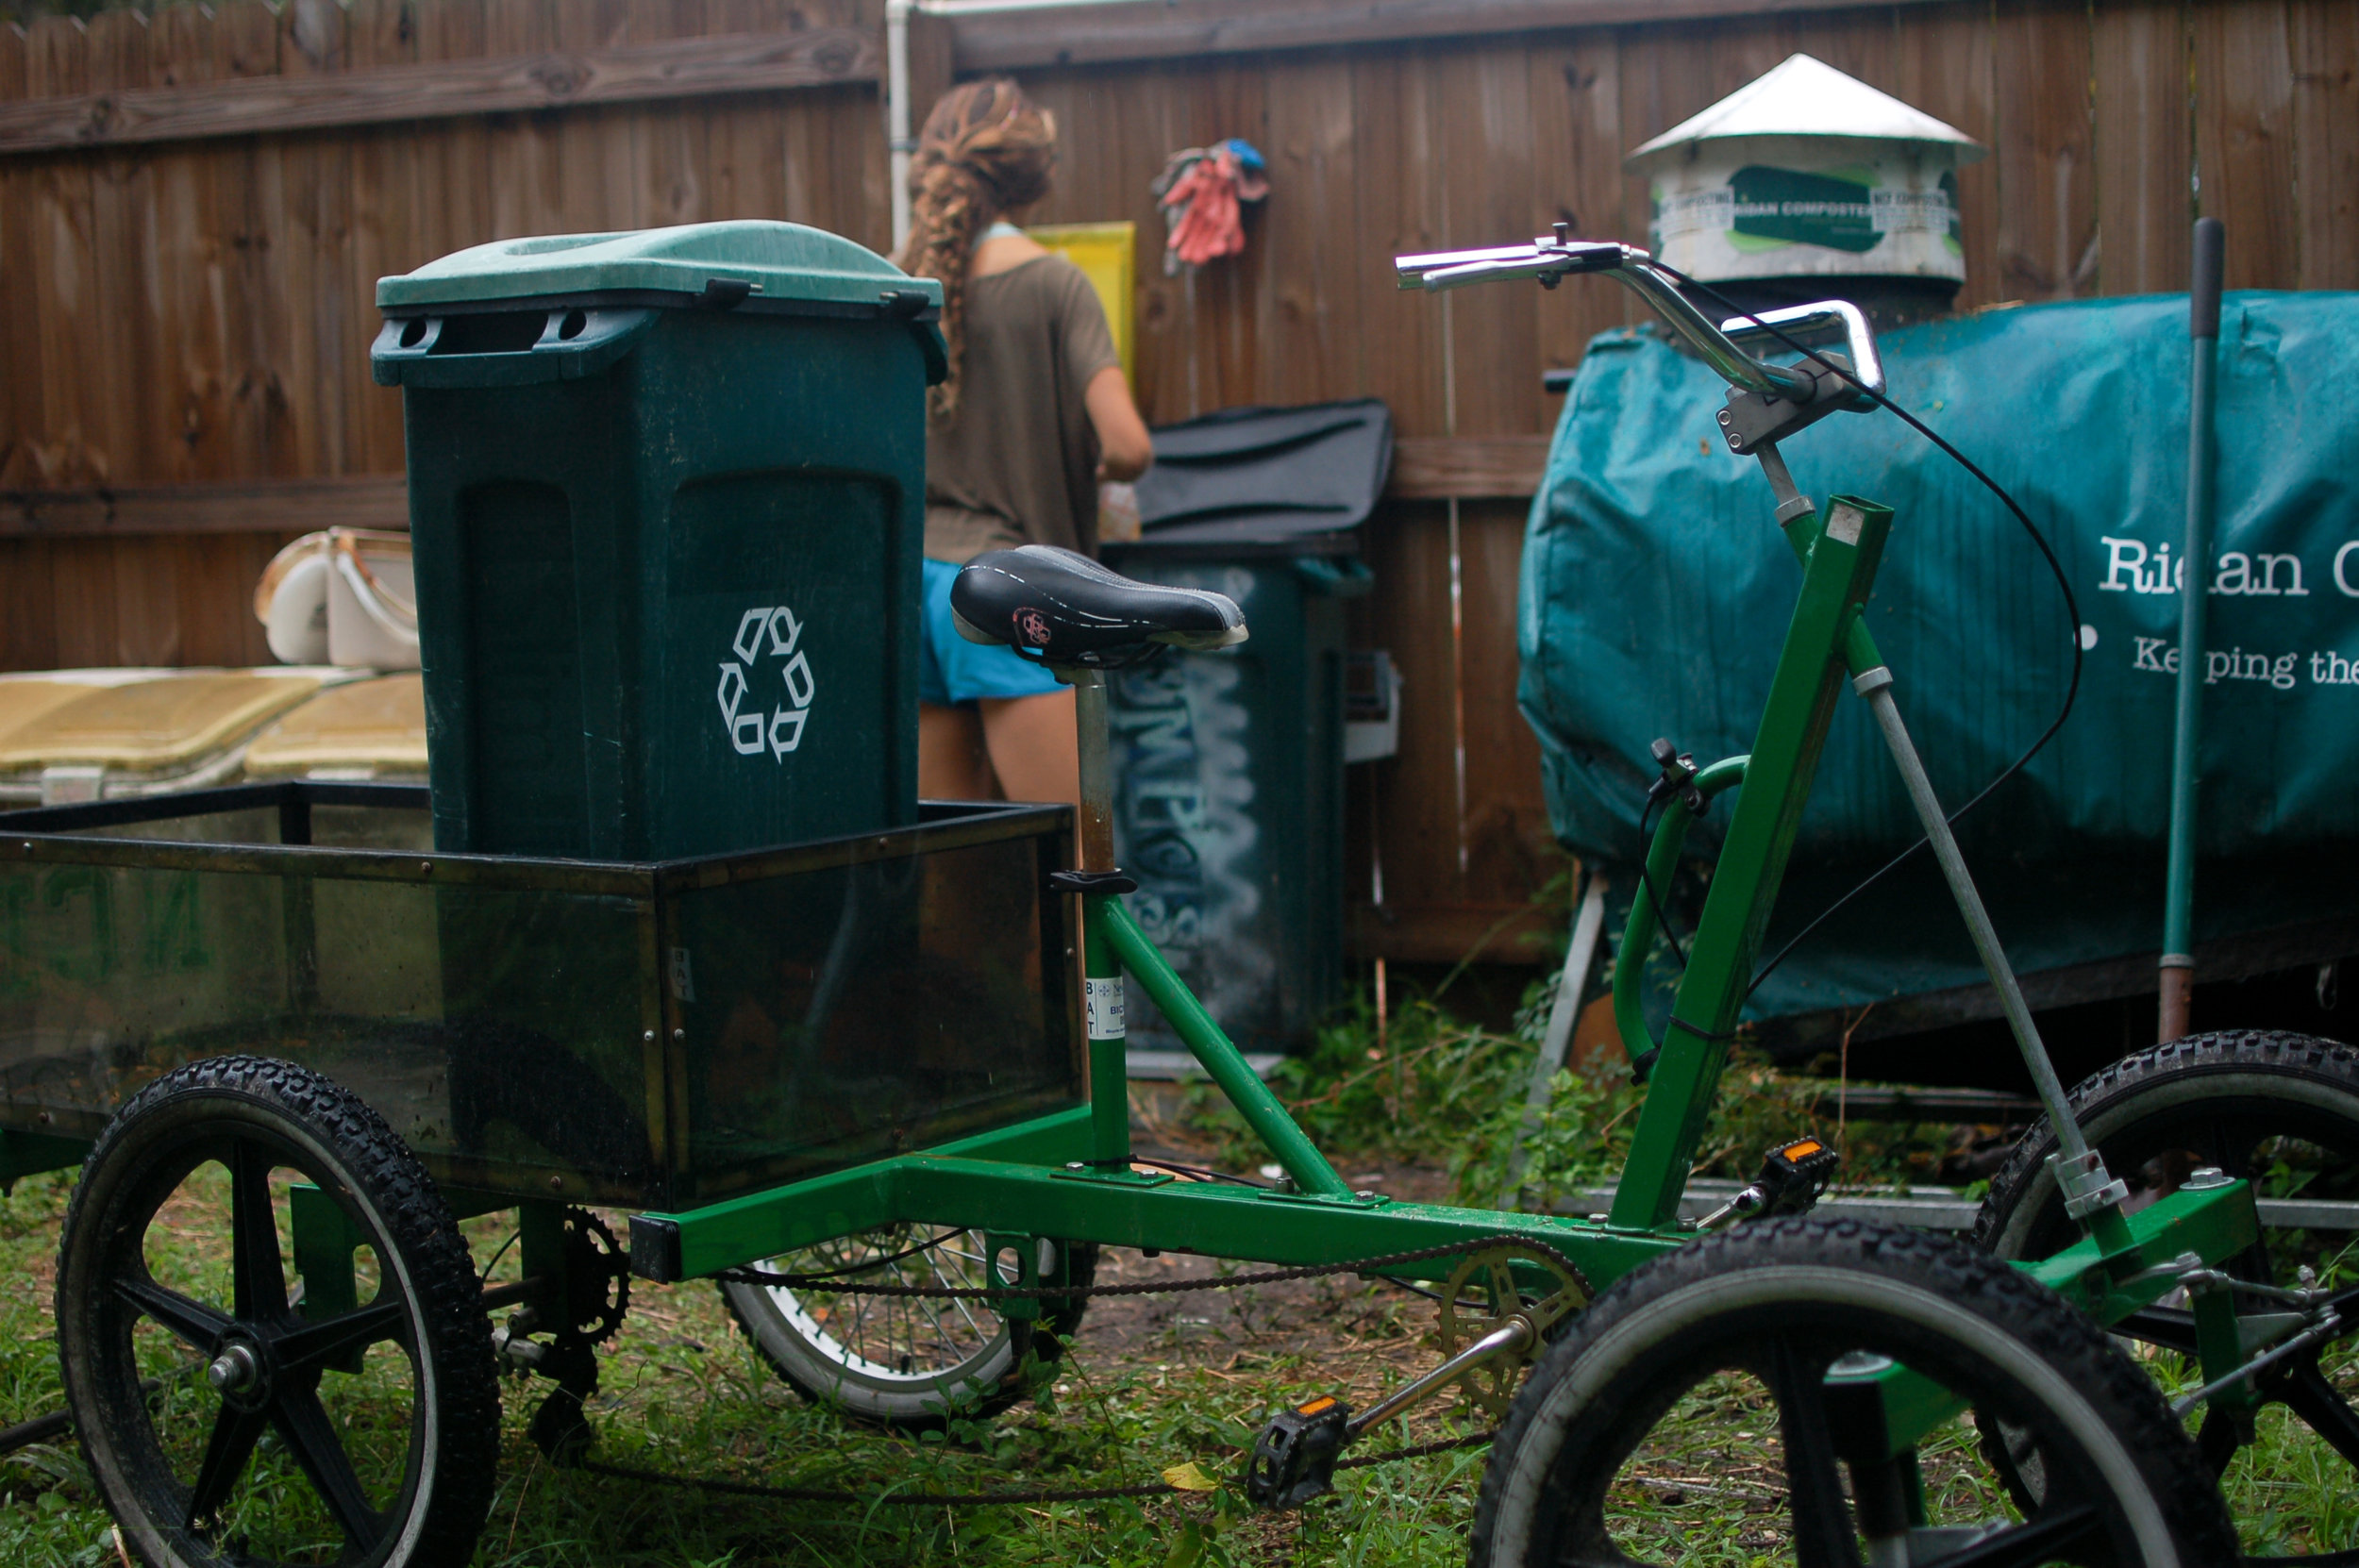 i 4 - compost - the compost bike - photos-5842.jpg